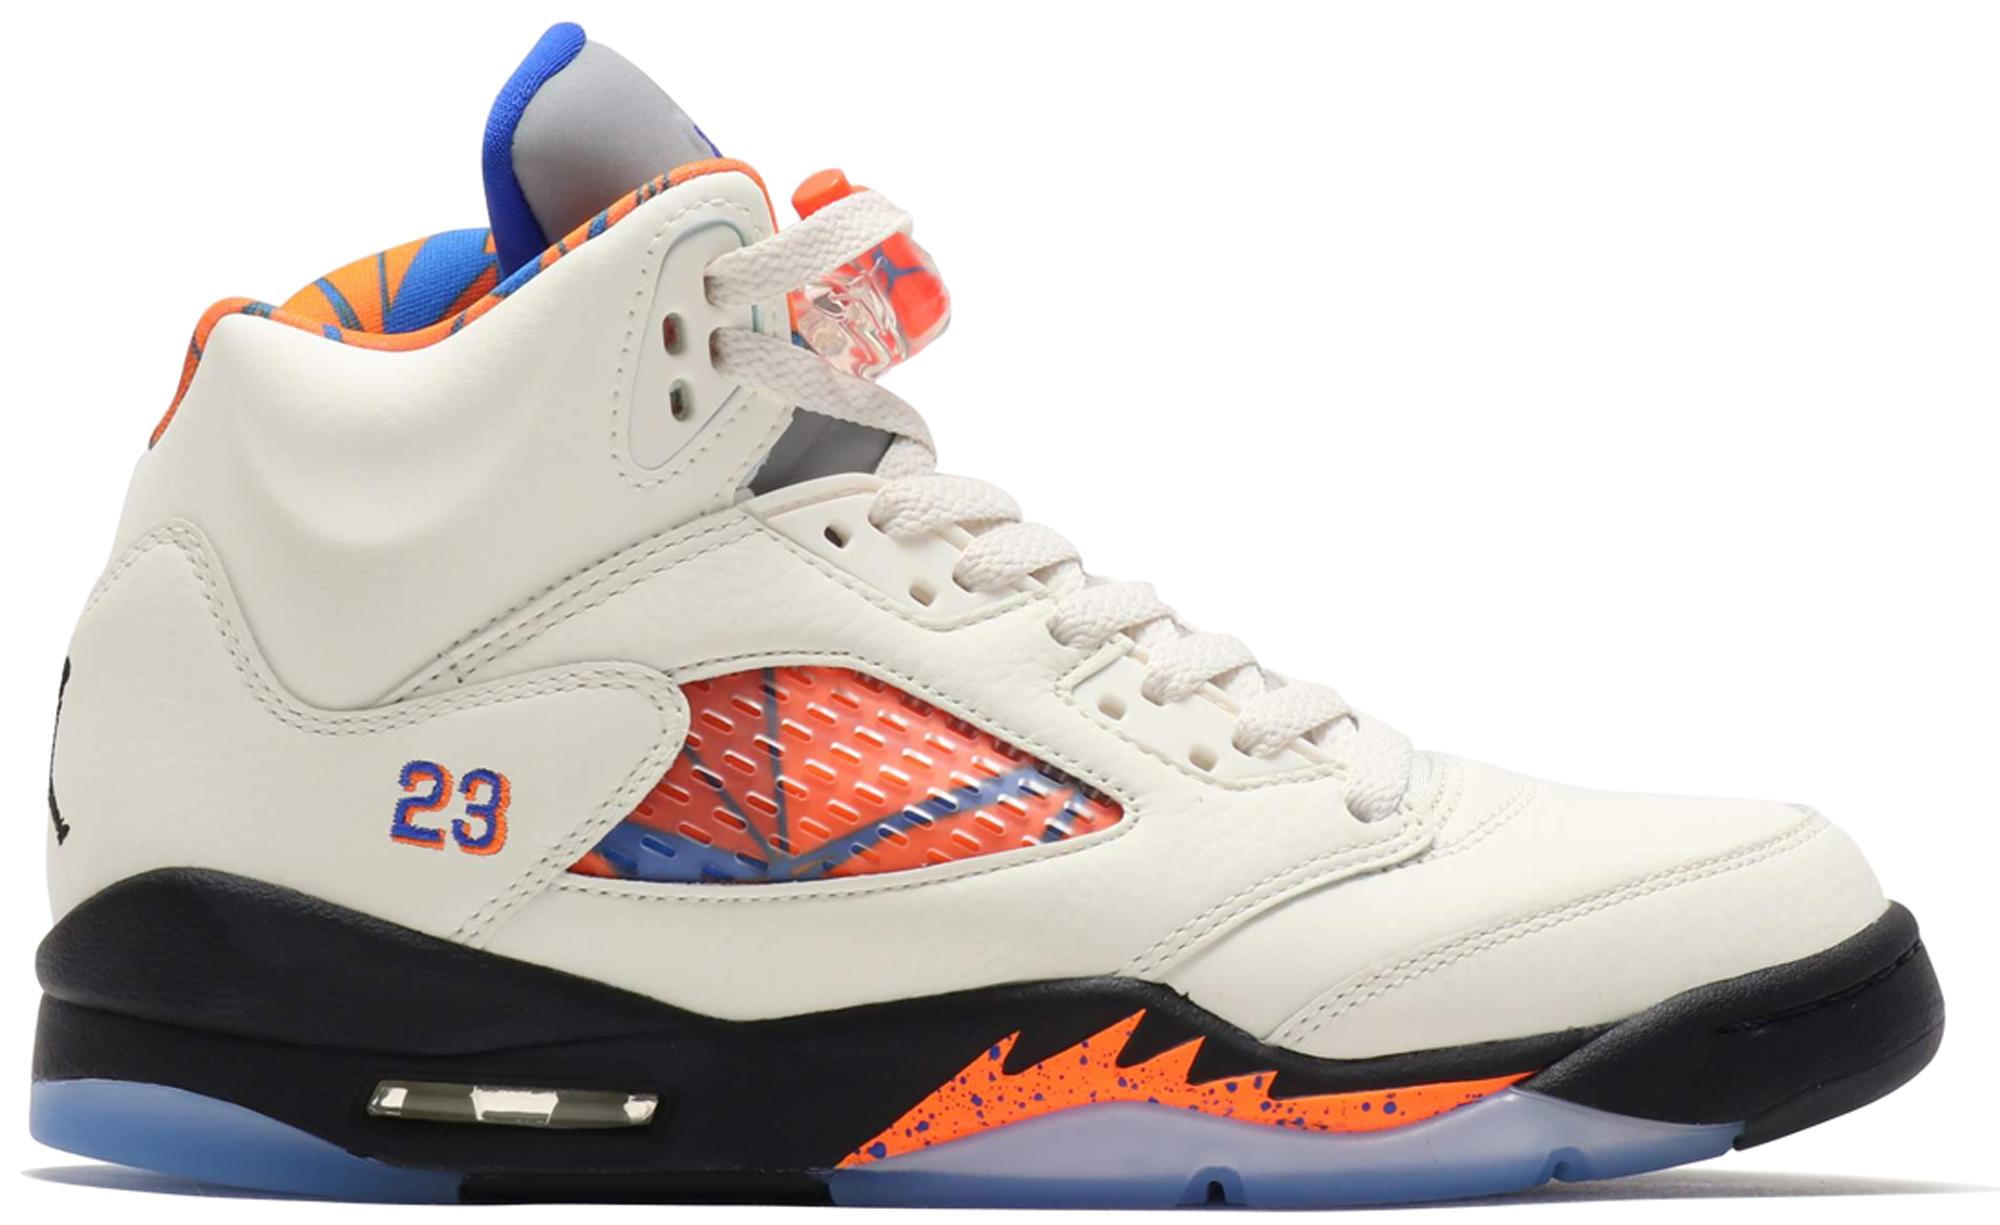 retro 5 jordan shoes